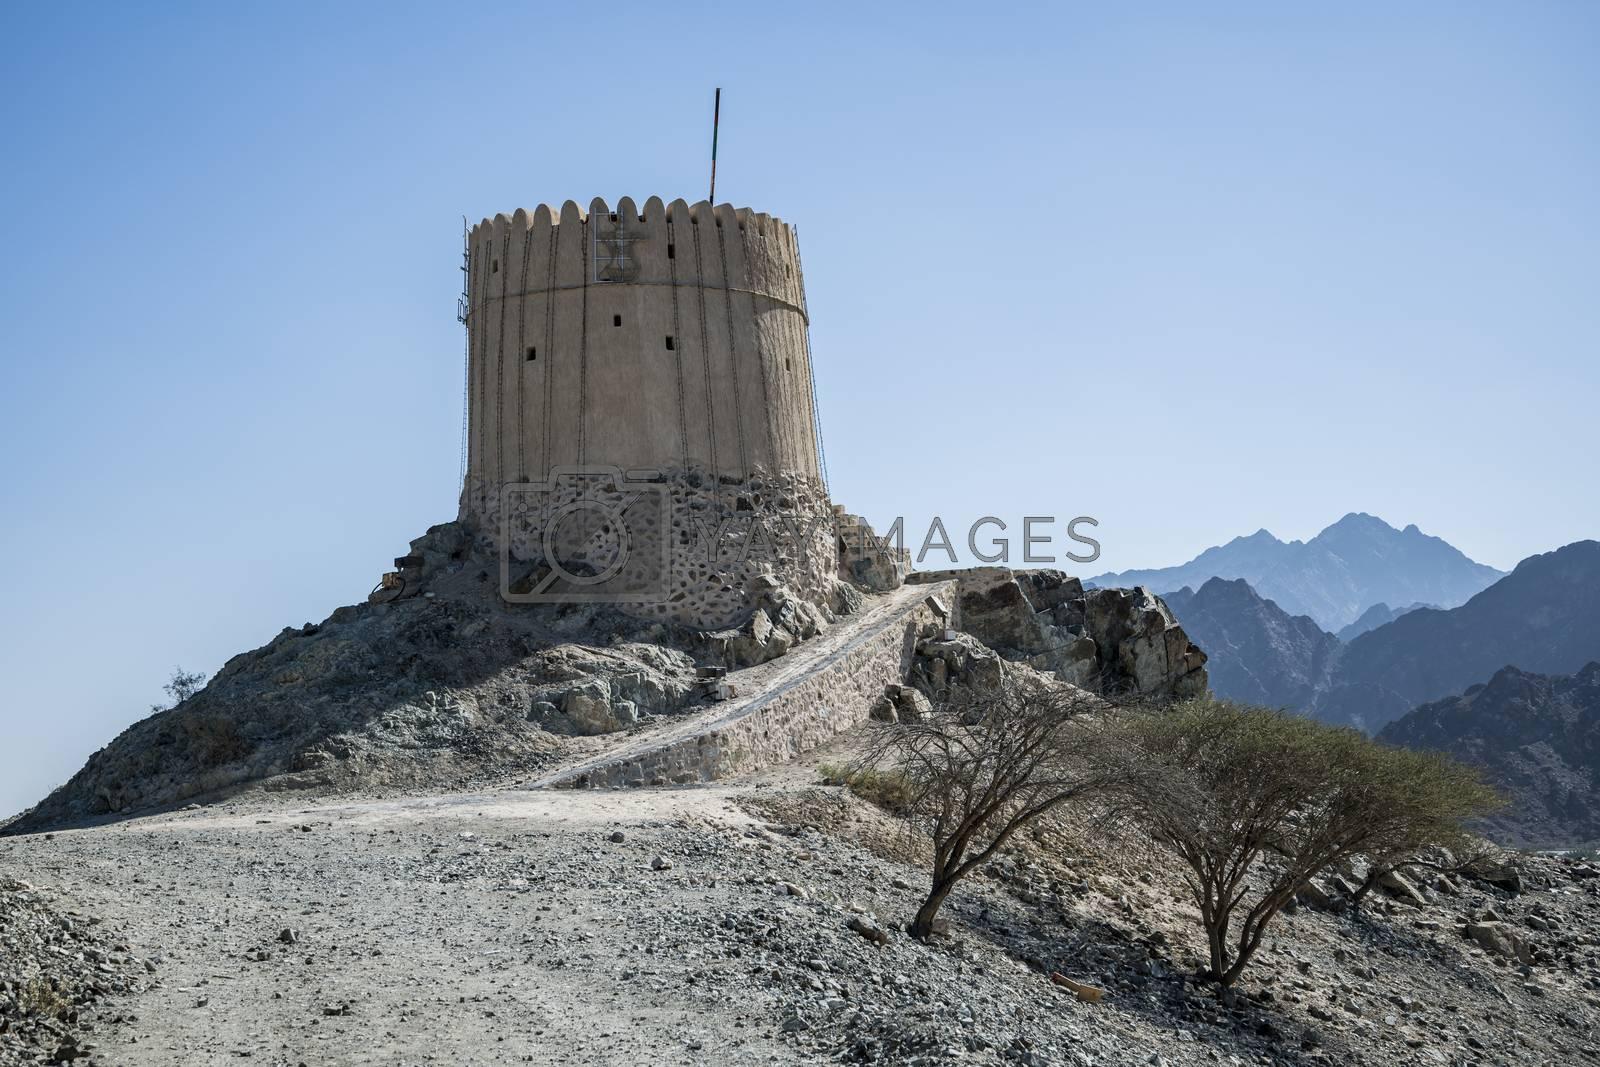 Ancient Watchtower in Hatta, Dubai Emirates, United Arab Emirates